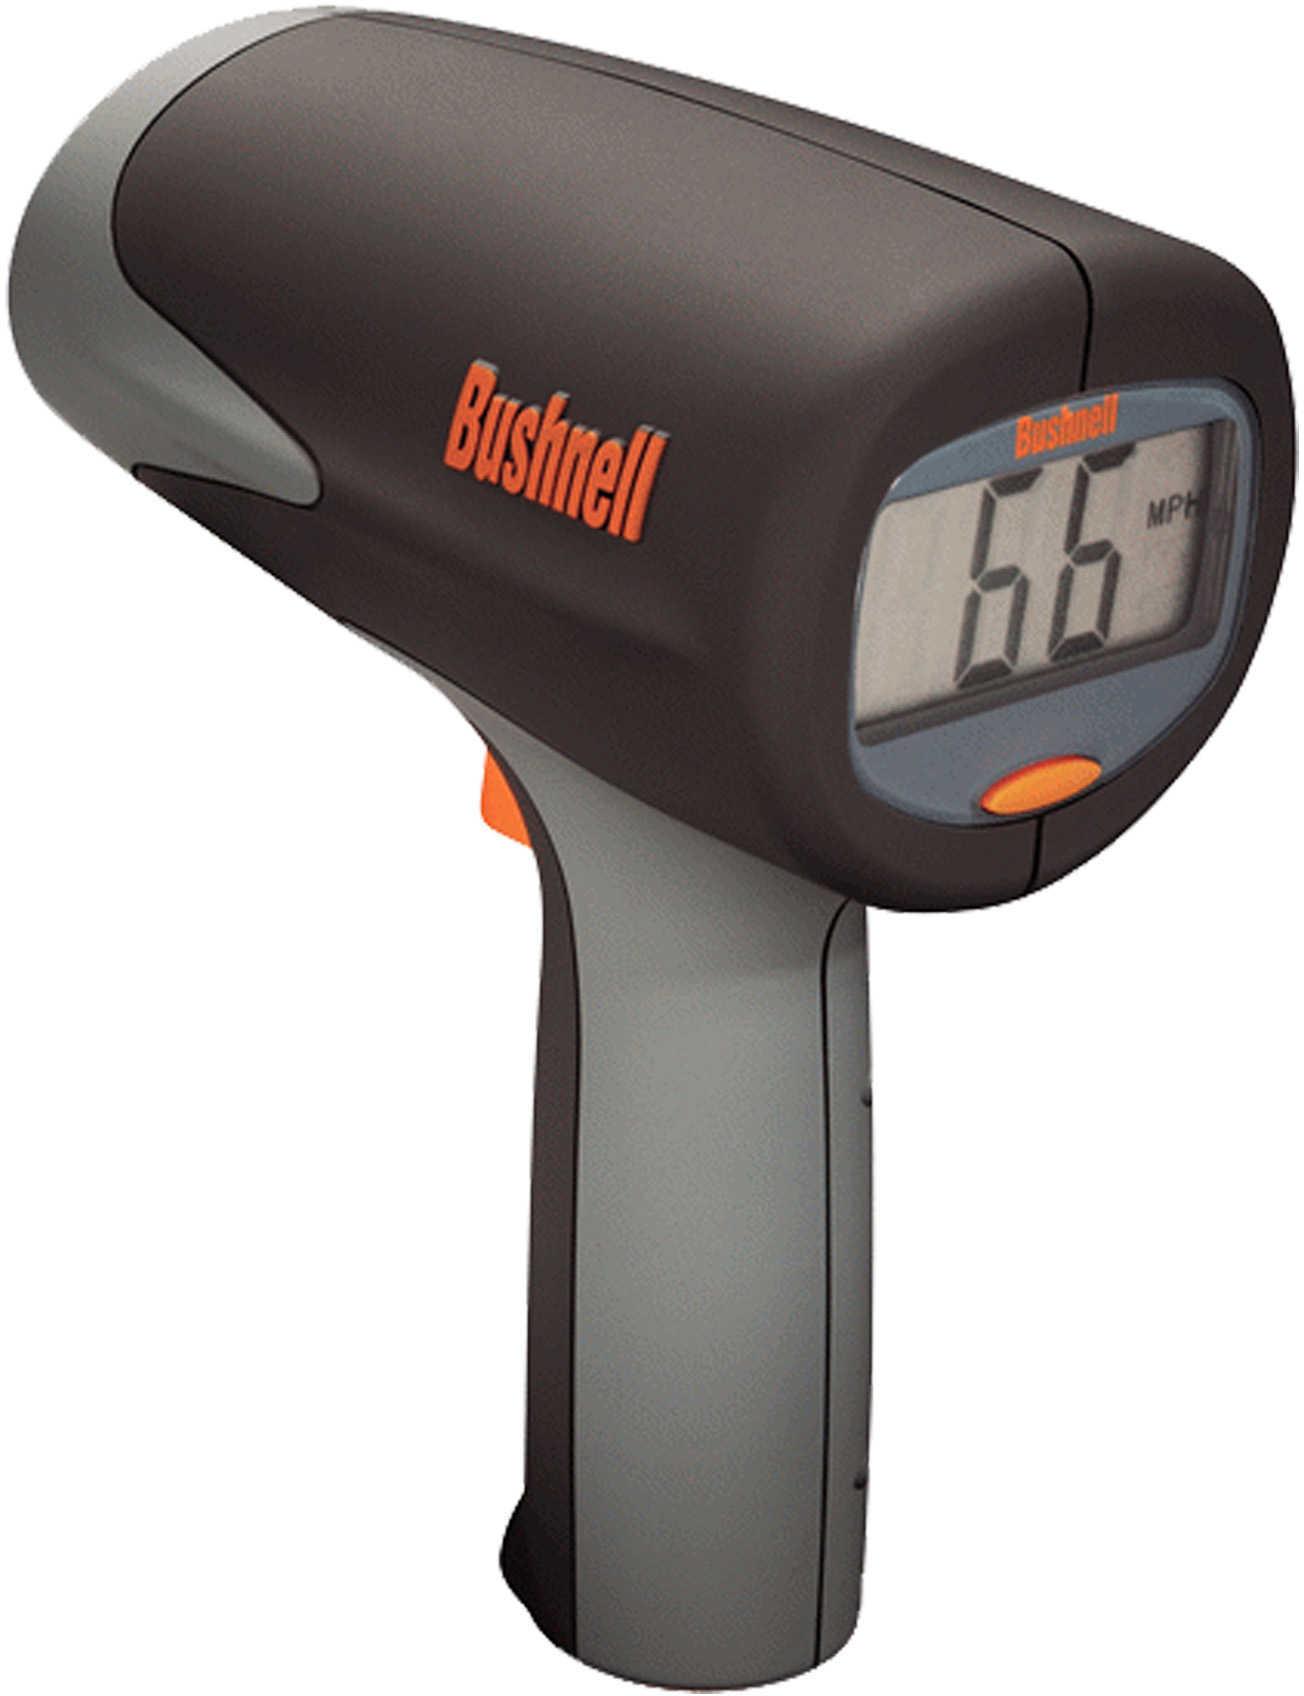 Bushnell Velocity, Grey, Point/Shoot Speed Gun 101911